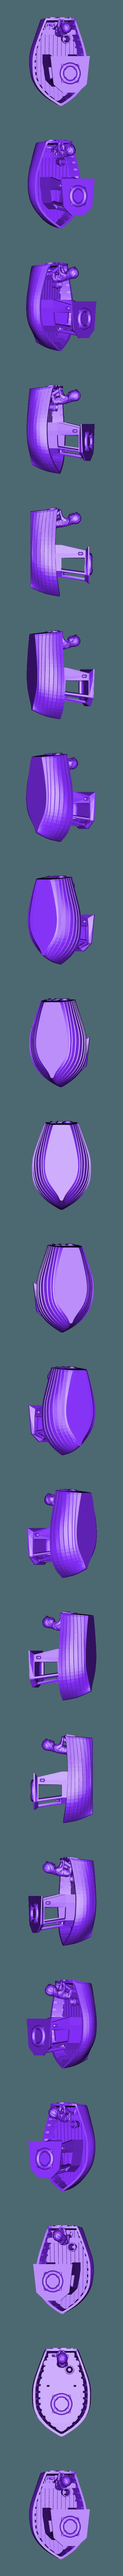 leo.stl Download free STL file LEO the little fishing boat (visual benchy) • 3D printer template, vandragon_de